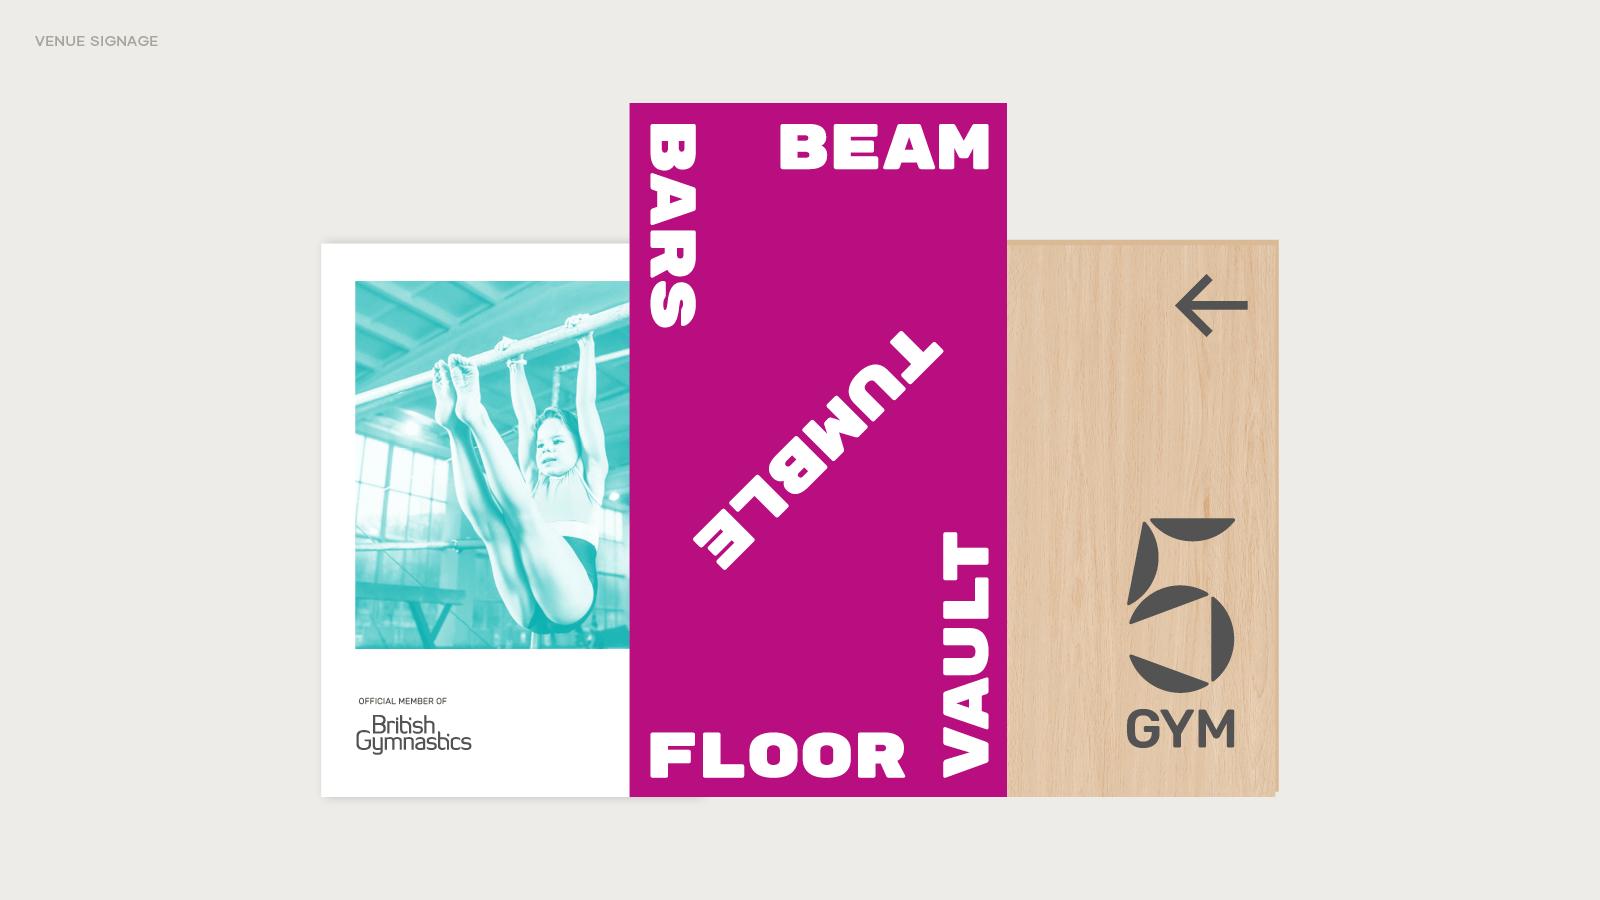 identity-design-logo-gym-gymnastics-british-five-typography-branding-milton-keynes-24